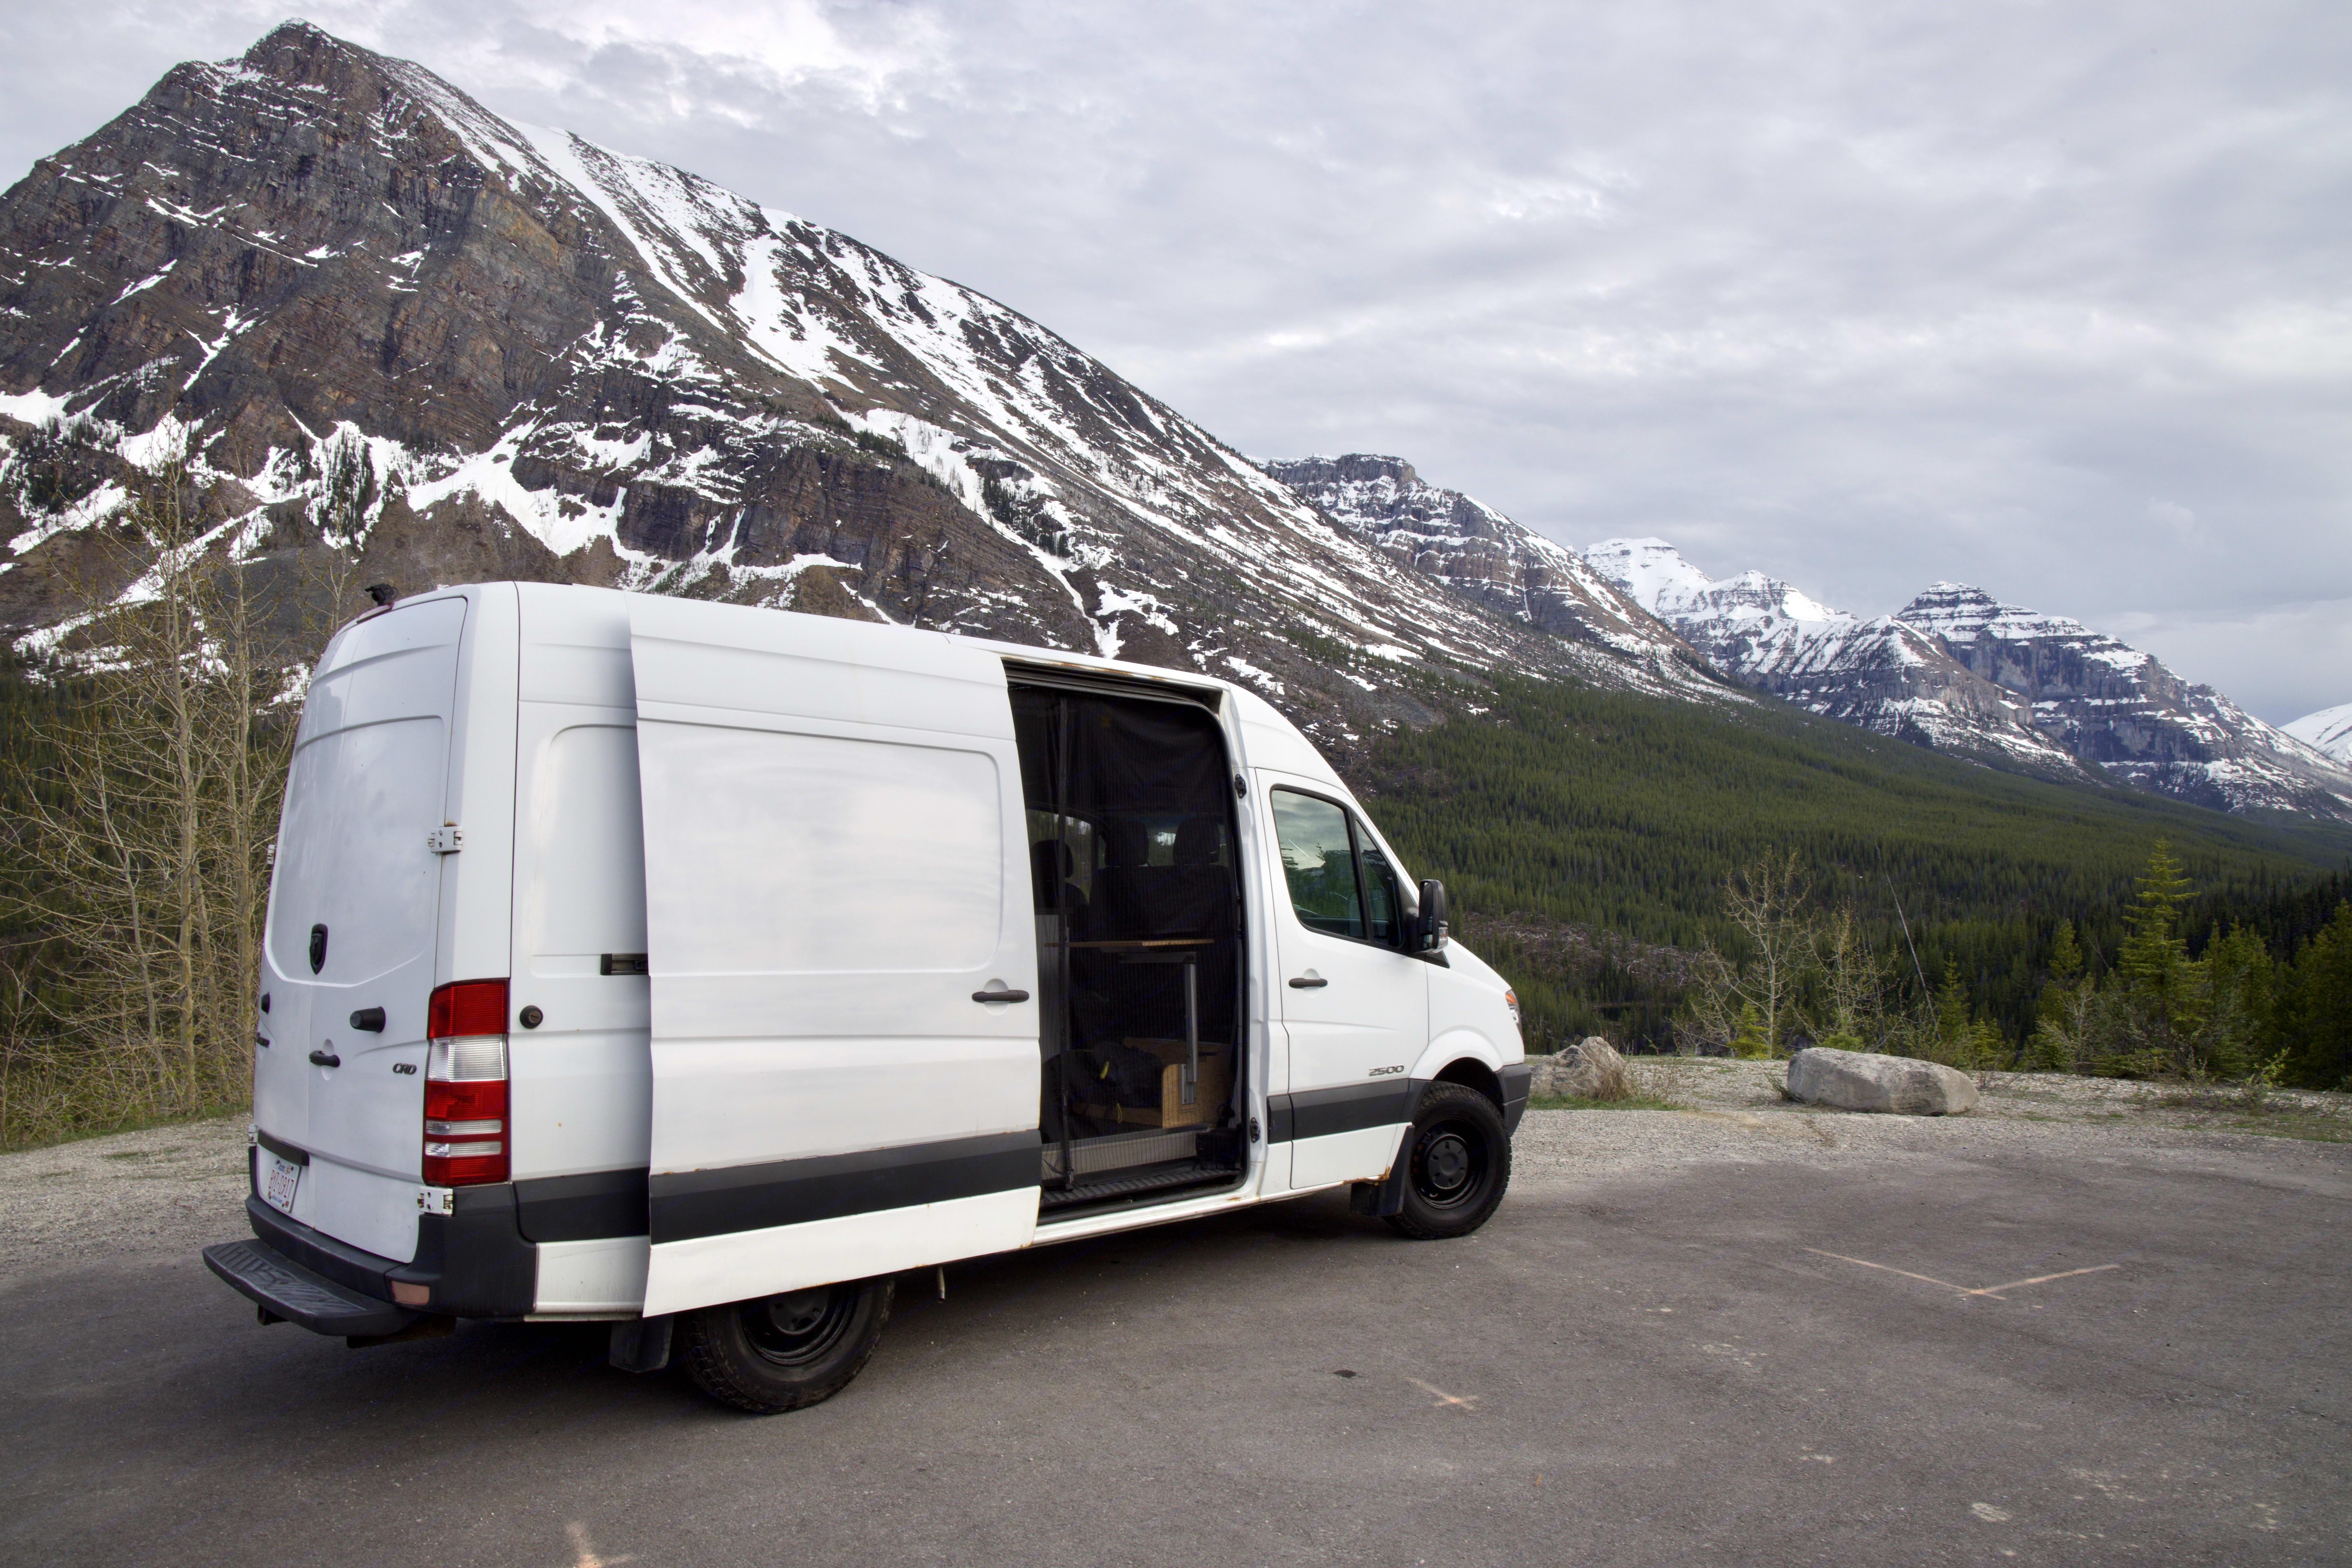 Kootenay National Park, BC, Lunch stop. Mercedes-Benz Sprinter 2008